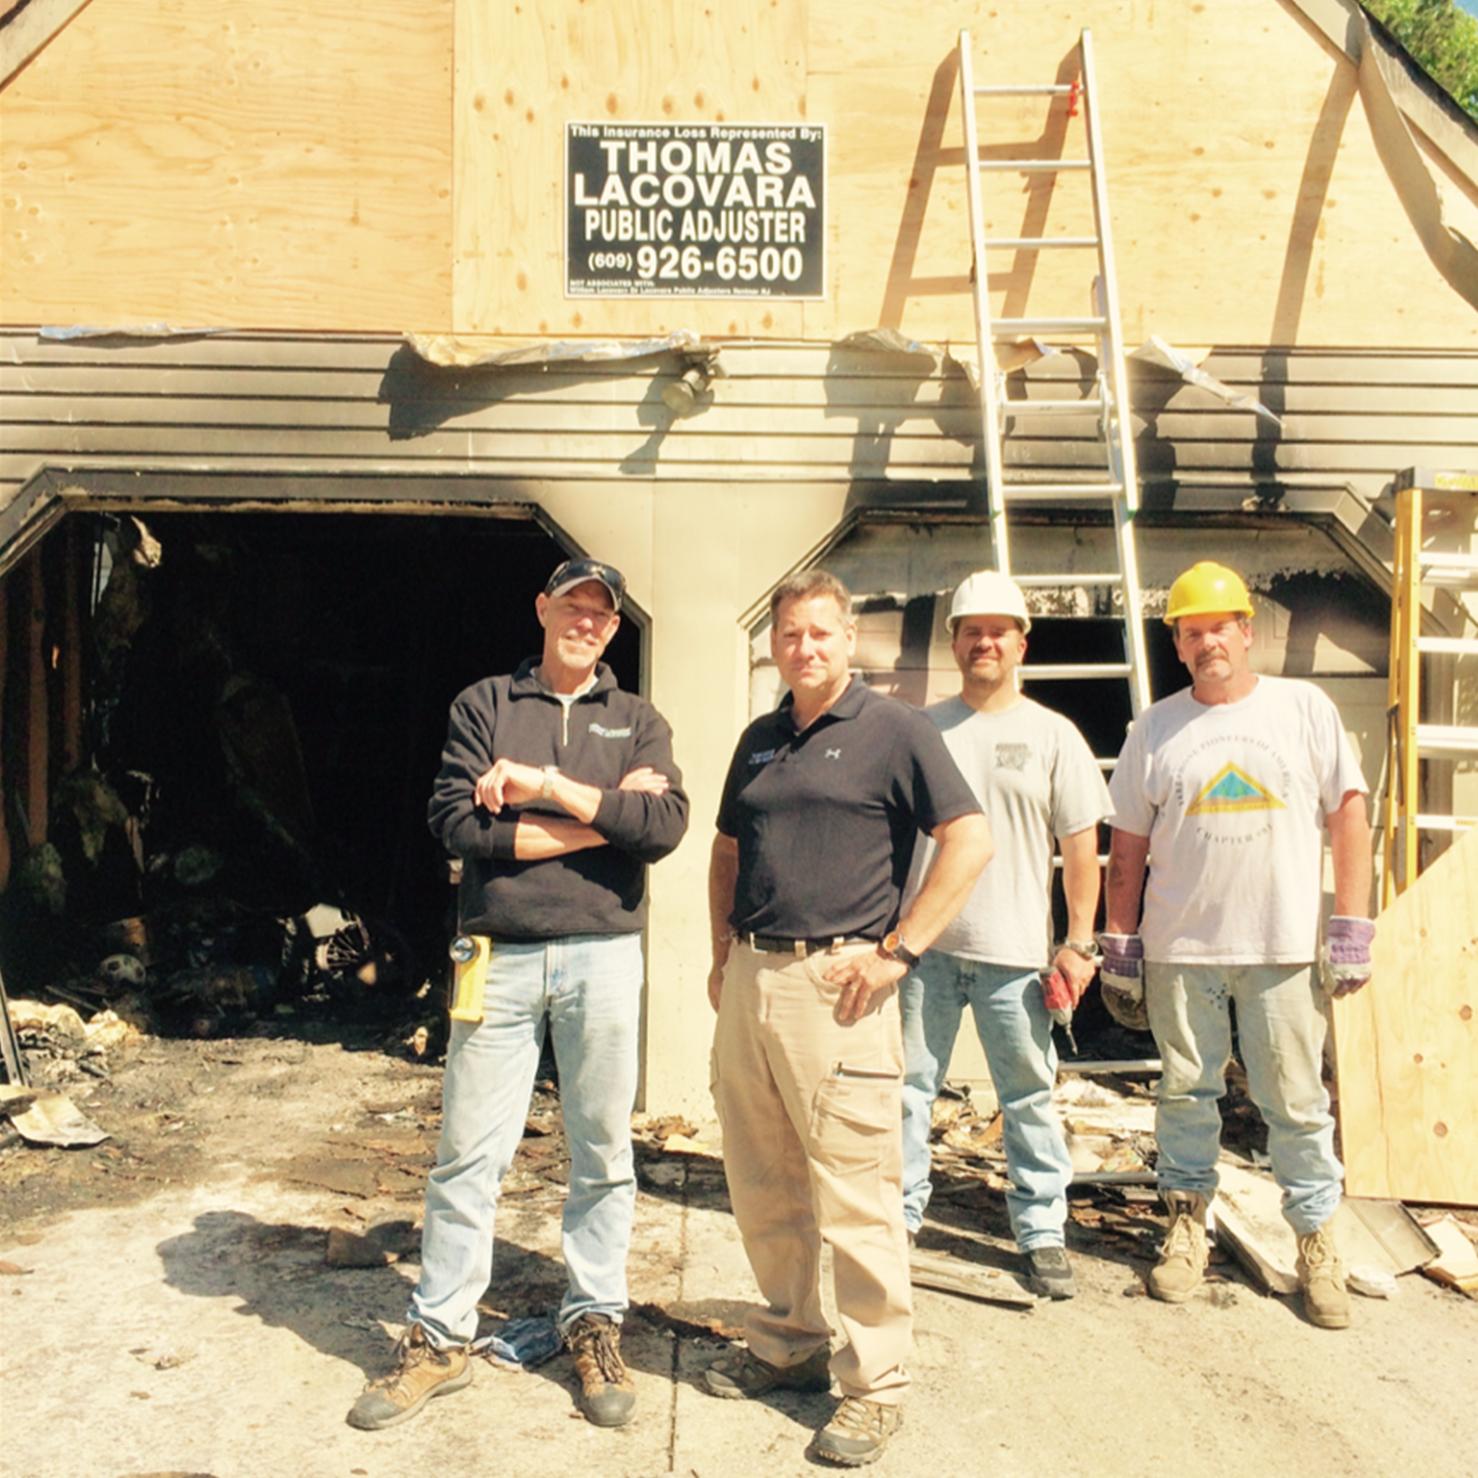 thomas lacovara and team on site